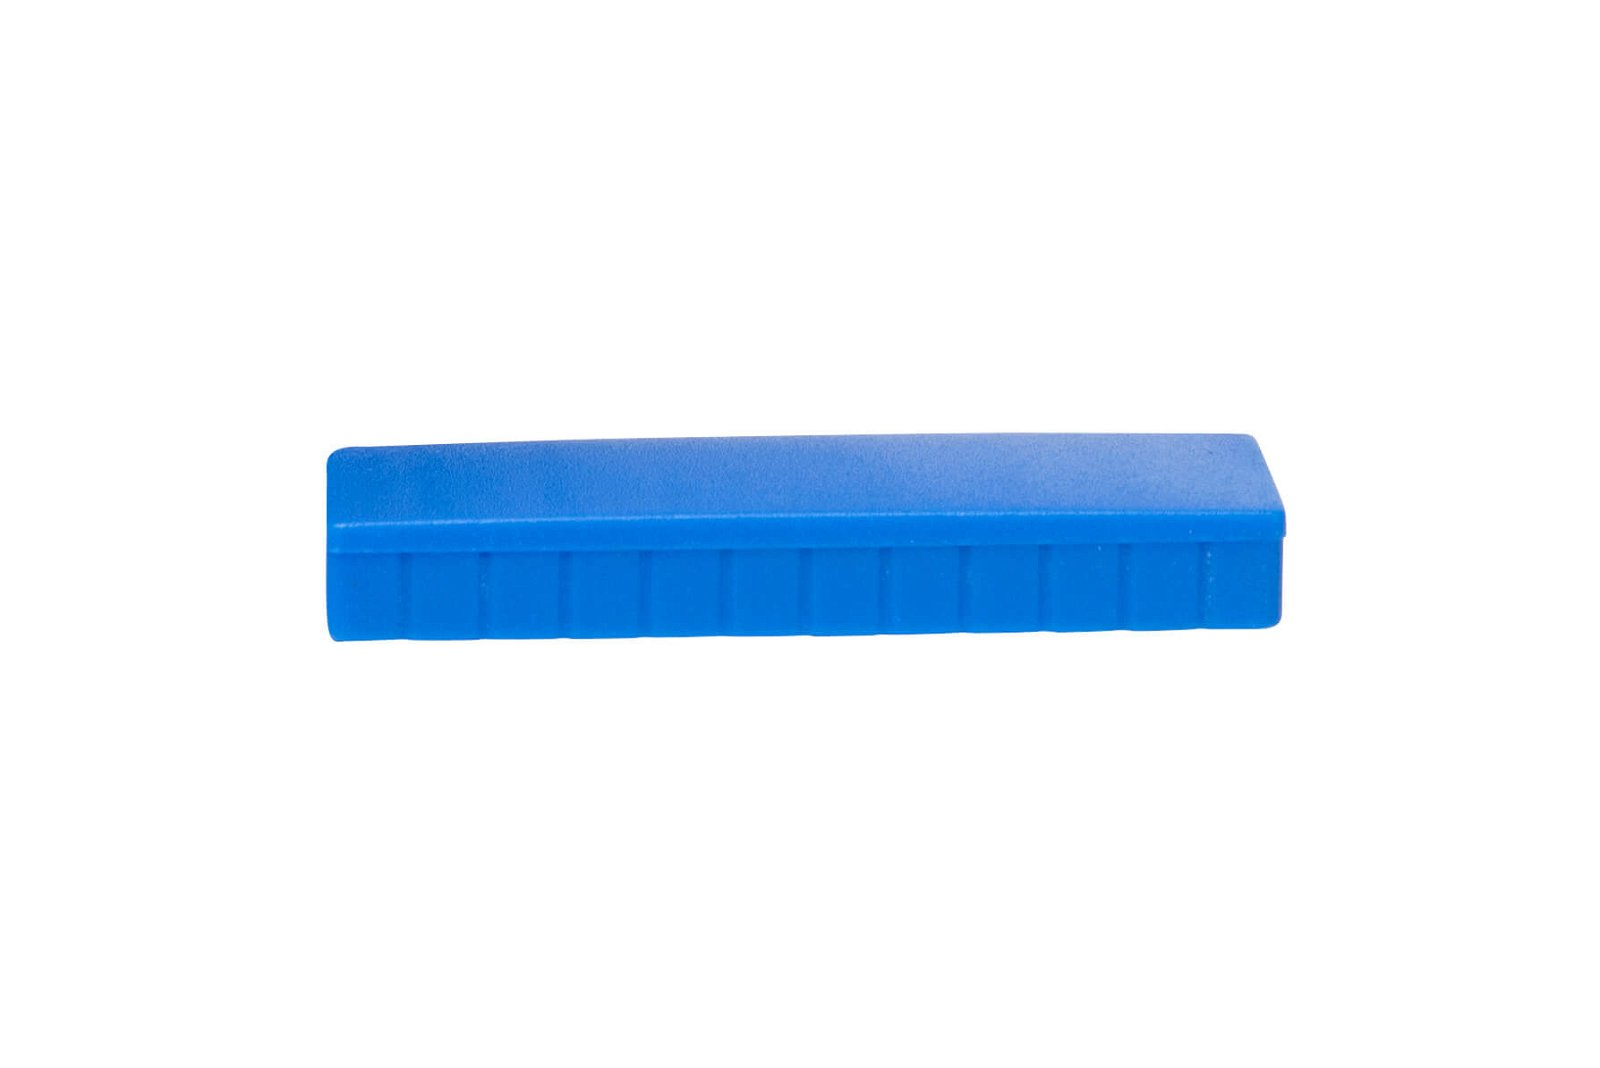 Magnet MAULsolid 54 x 19 mm, 1 kg Haftkraft, 10 St./Ktn., blau